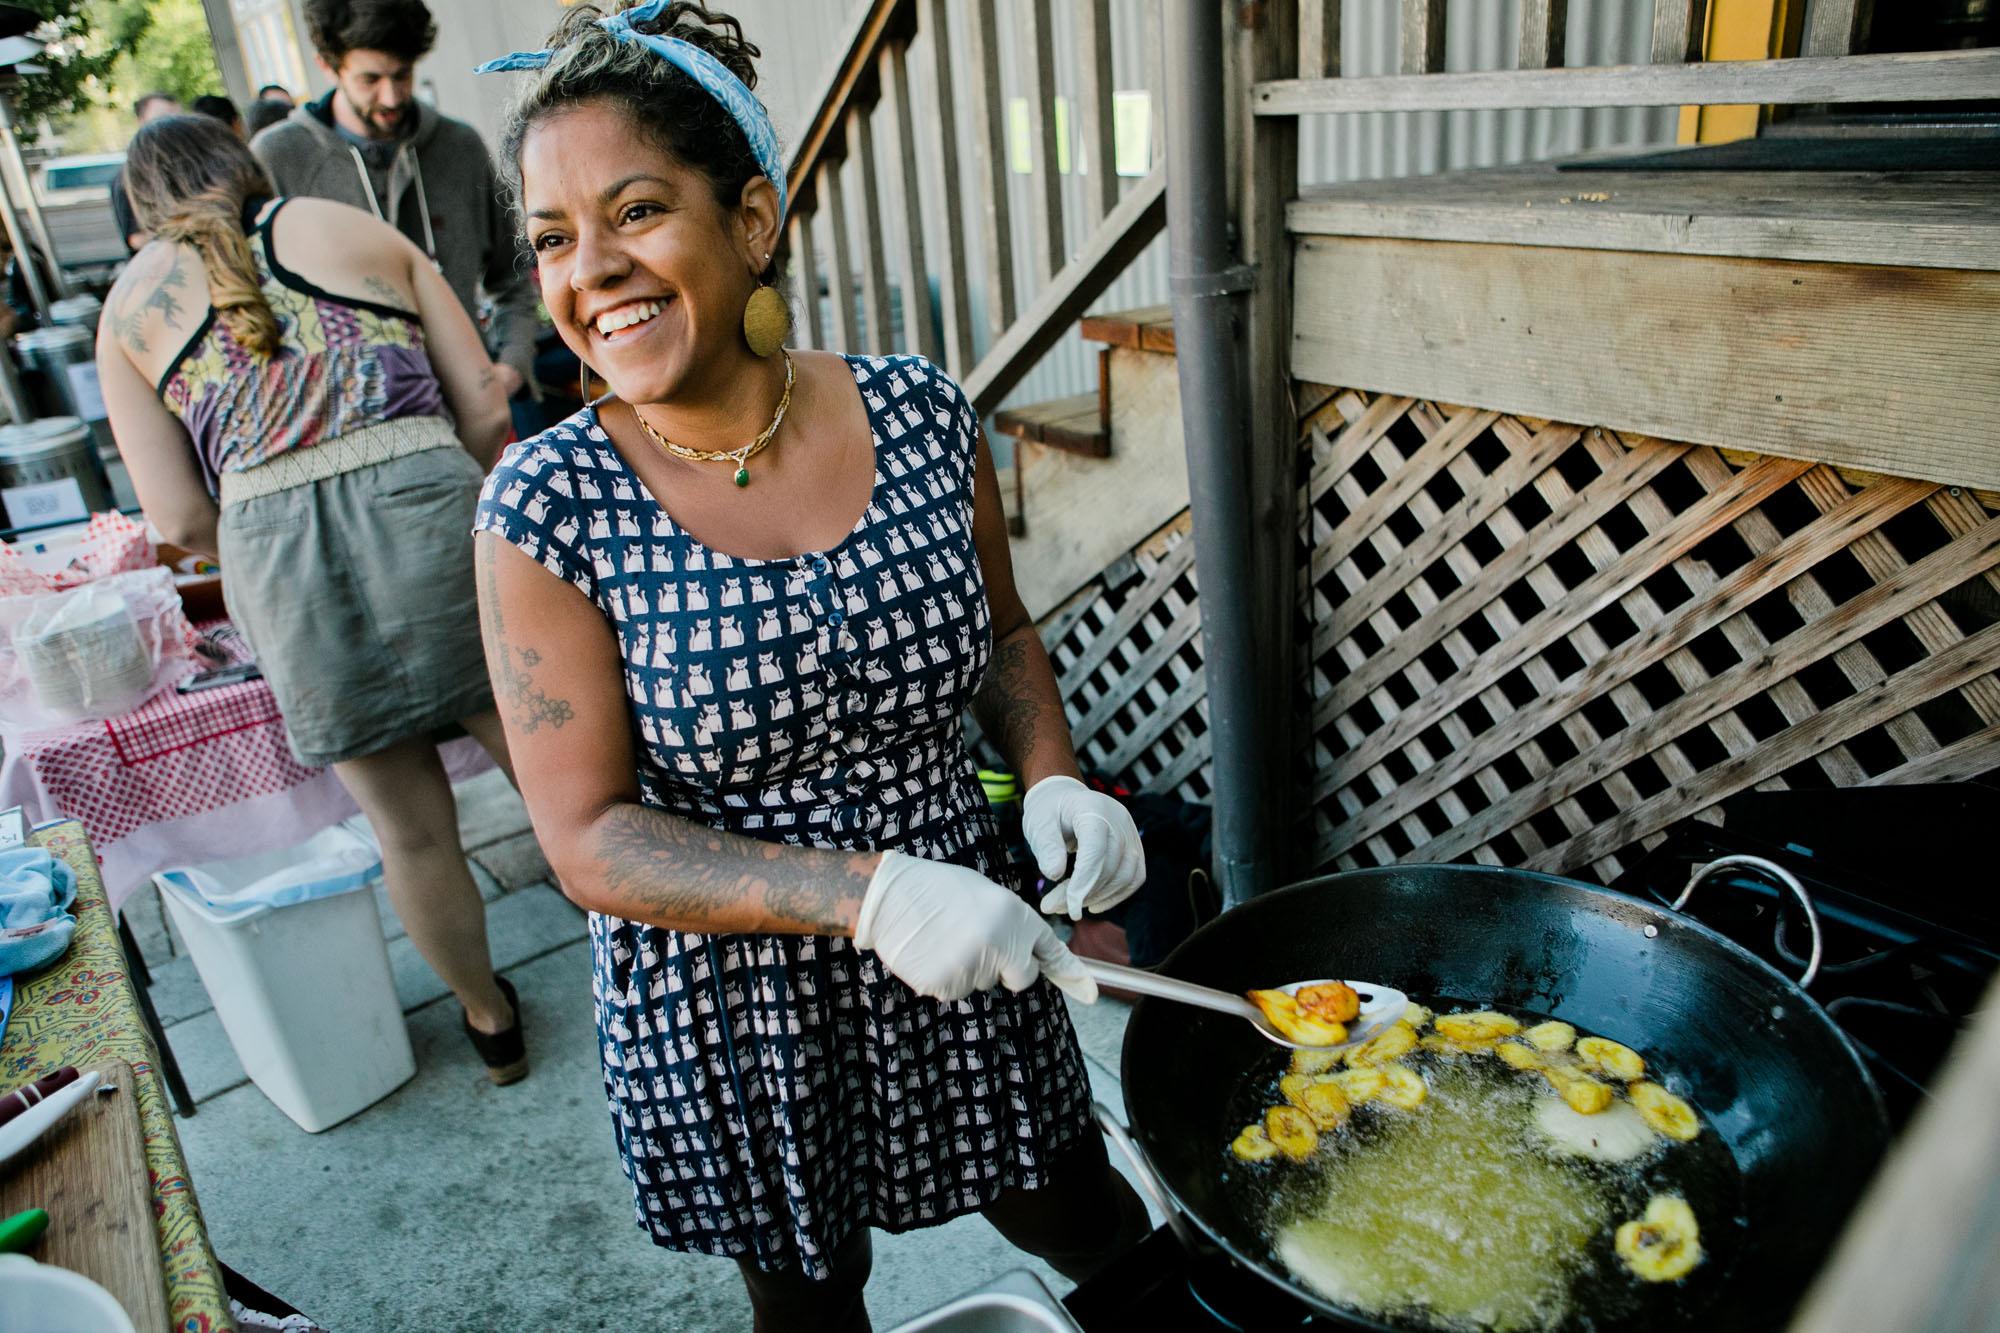 woman_cooling_outdoor_pop_up_food_truck.jpg